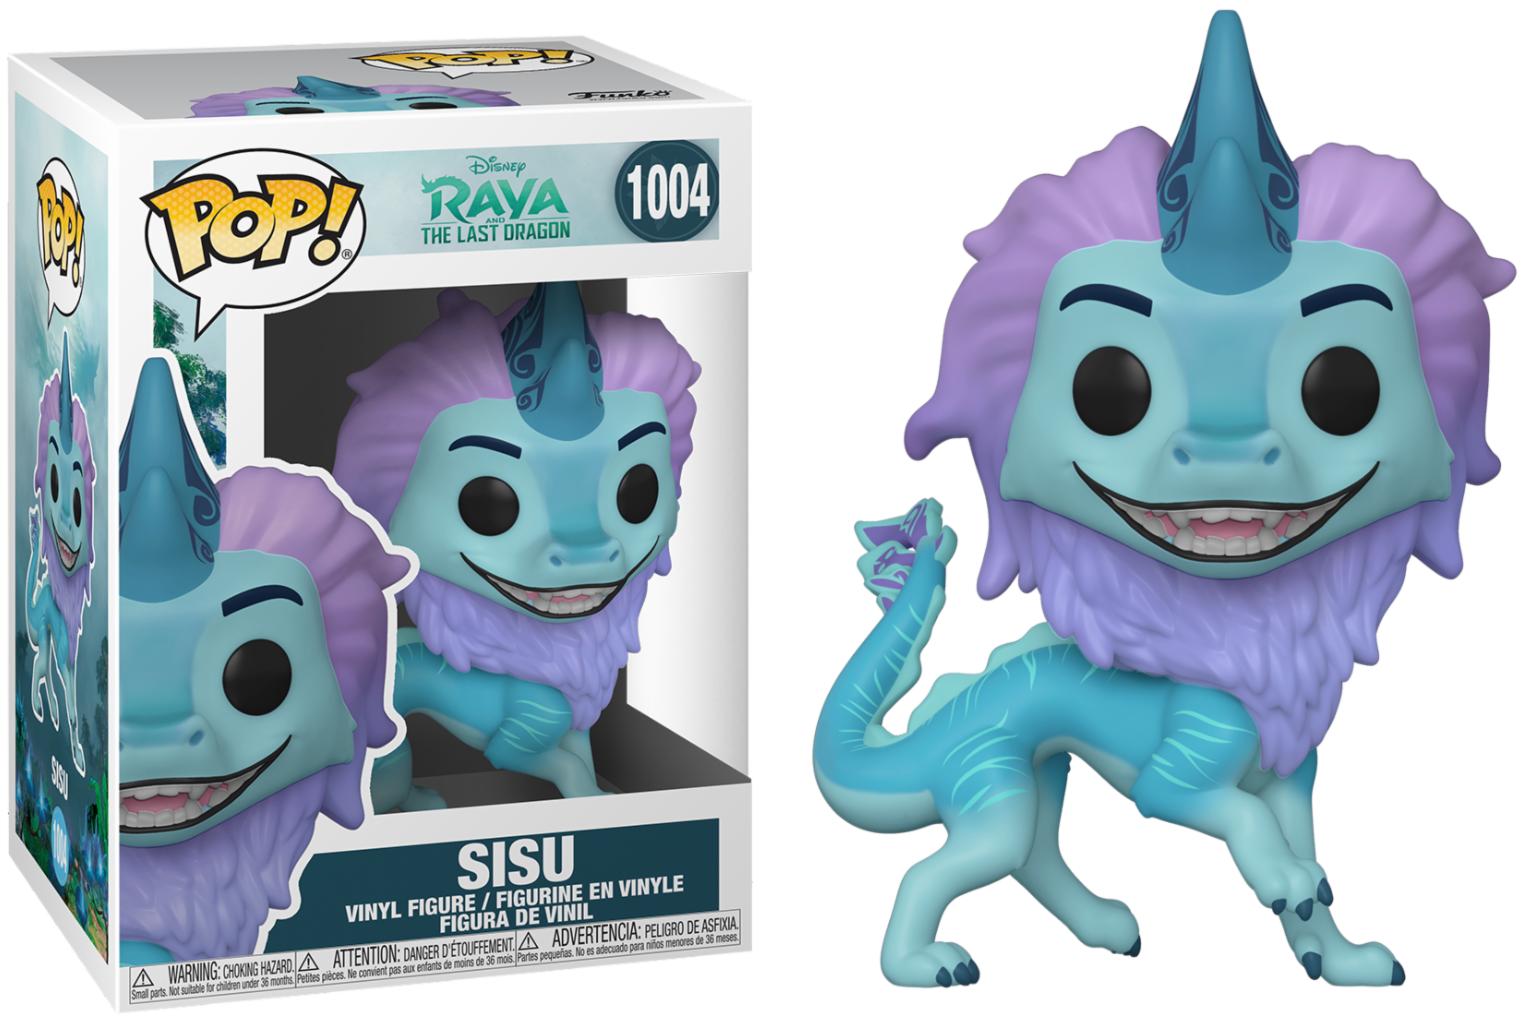 Pré-commande! Raya, The Last Dragon - Bobble Head Funko Pop N°1004 : Sisu